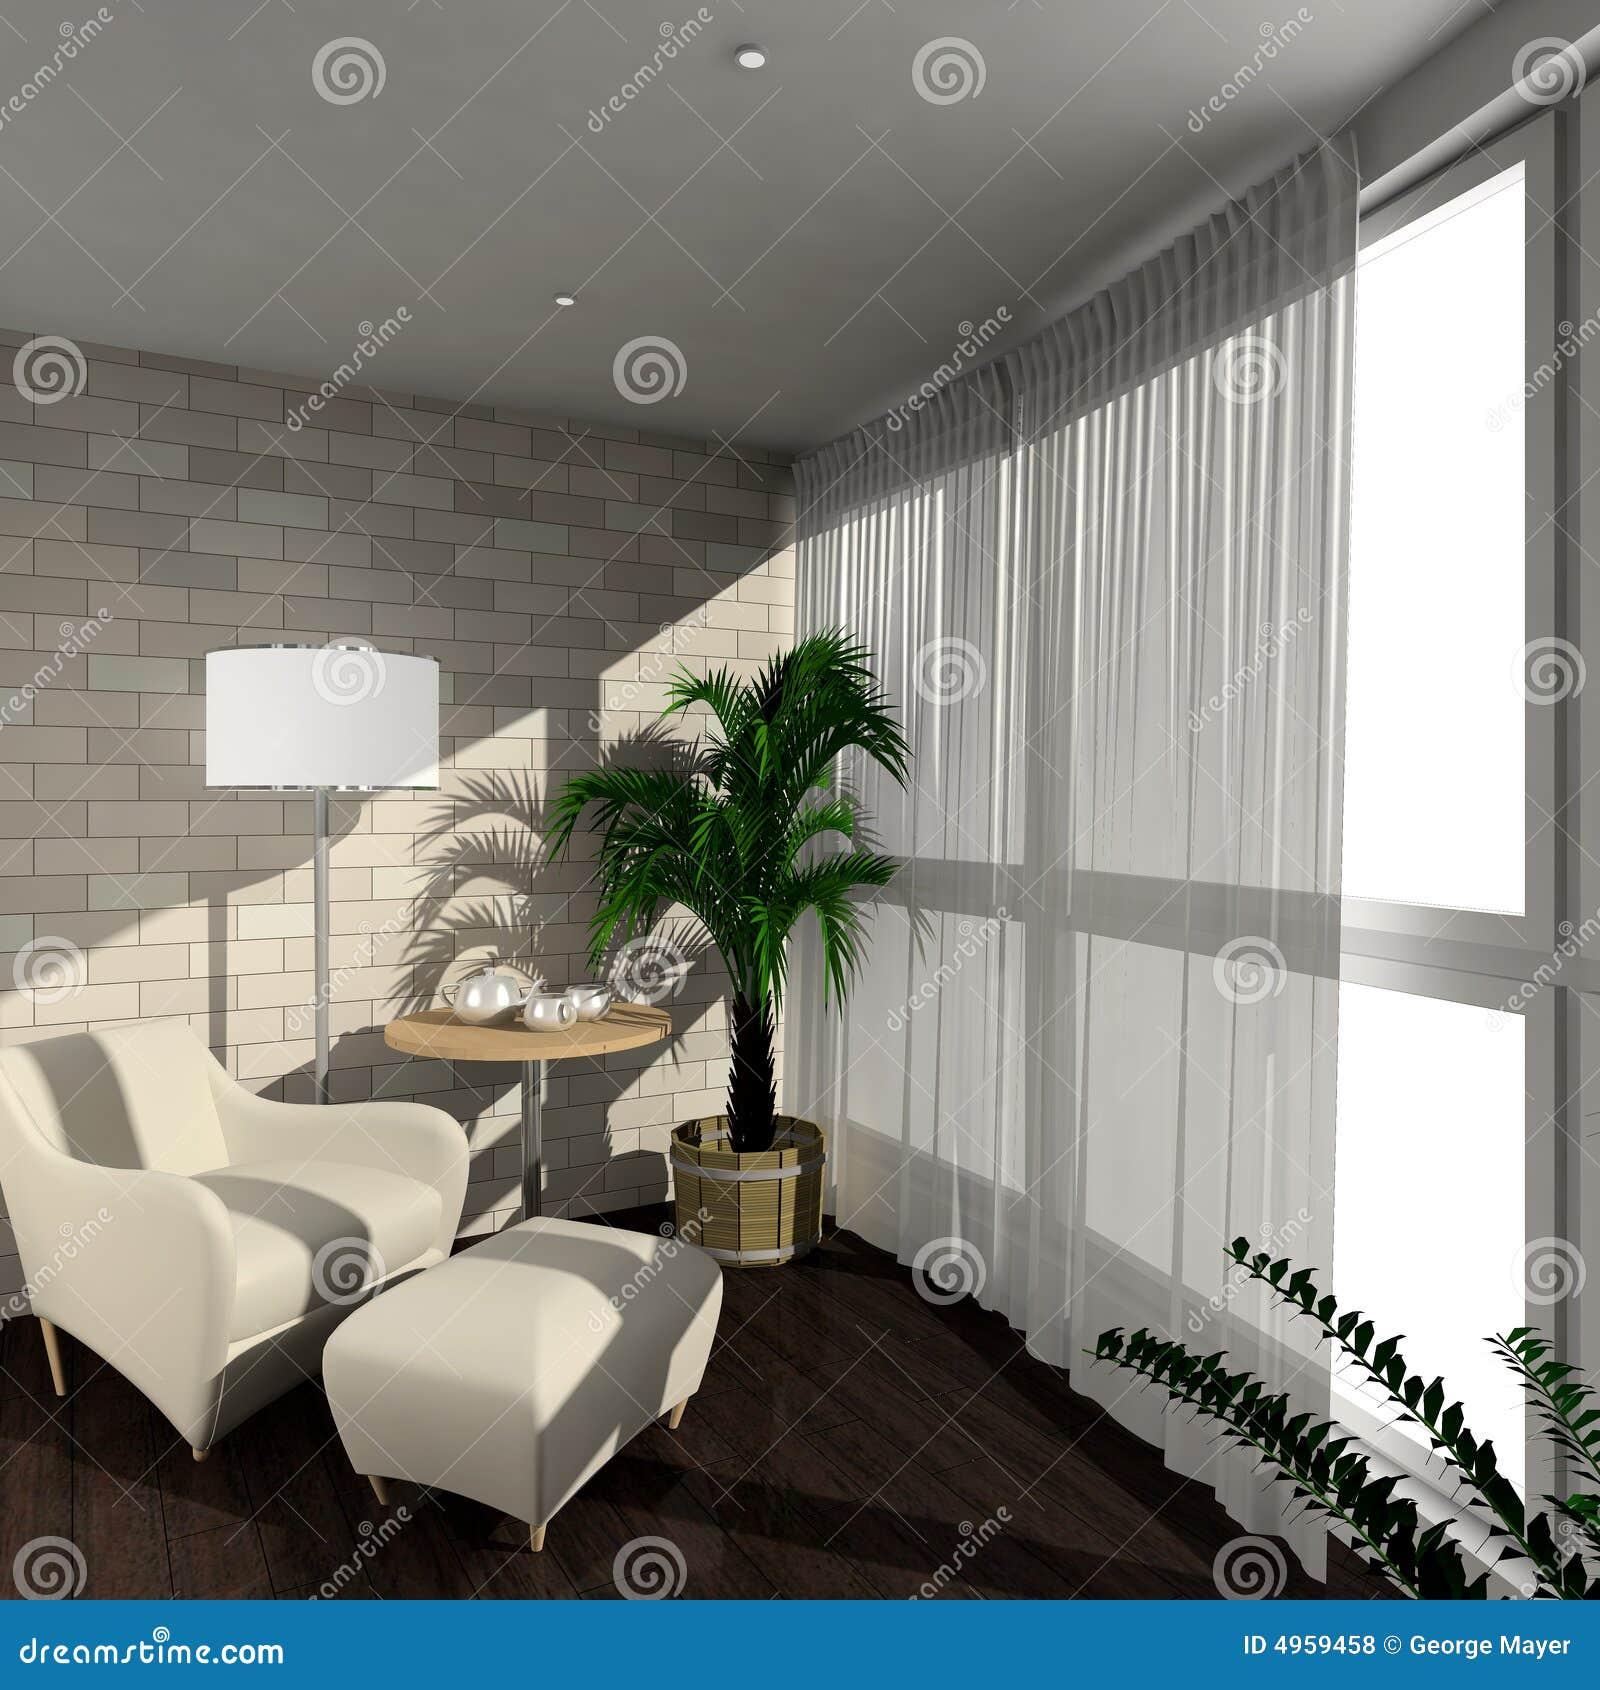 3d rendent l 39 int rieur moderne de la v randa photos libres de droits image 4959458. Black Bedroom Furniture Sets. Home Design Ideas